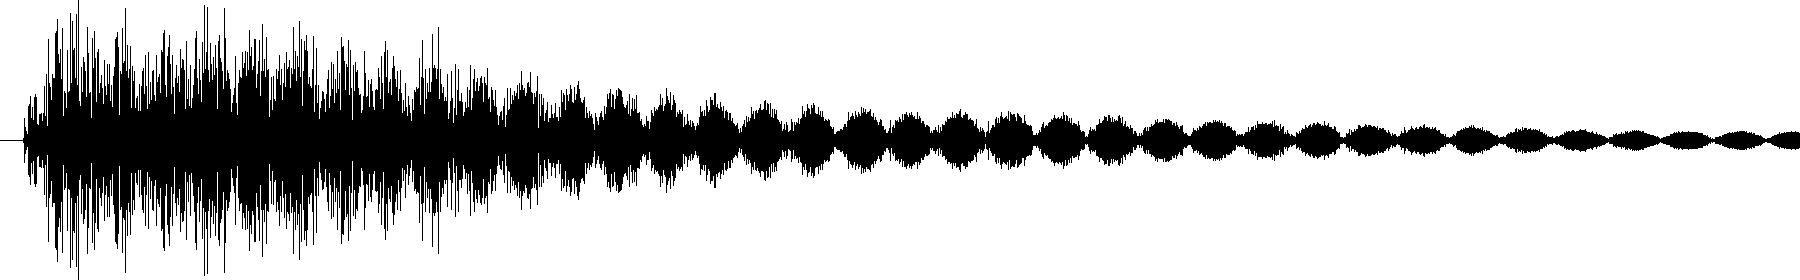 perc 1 1